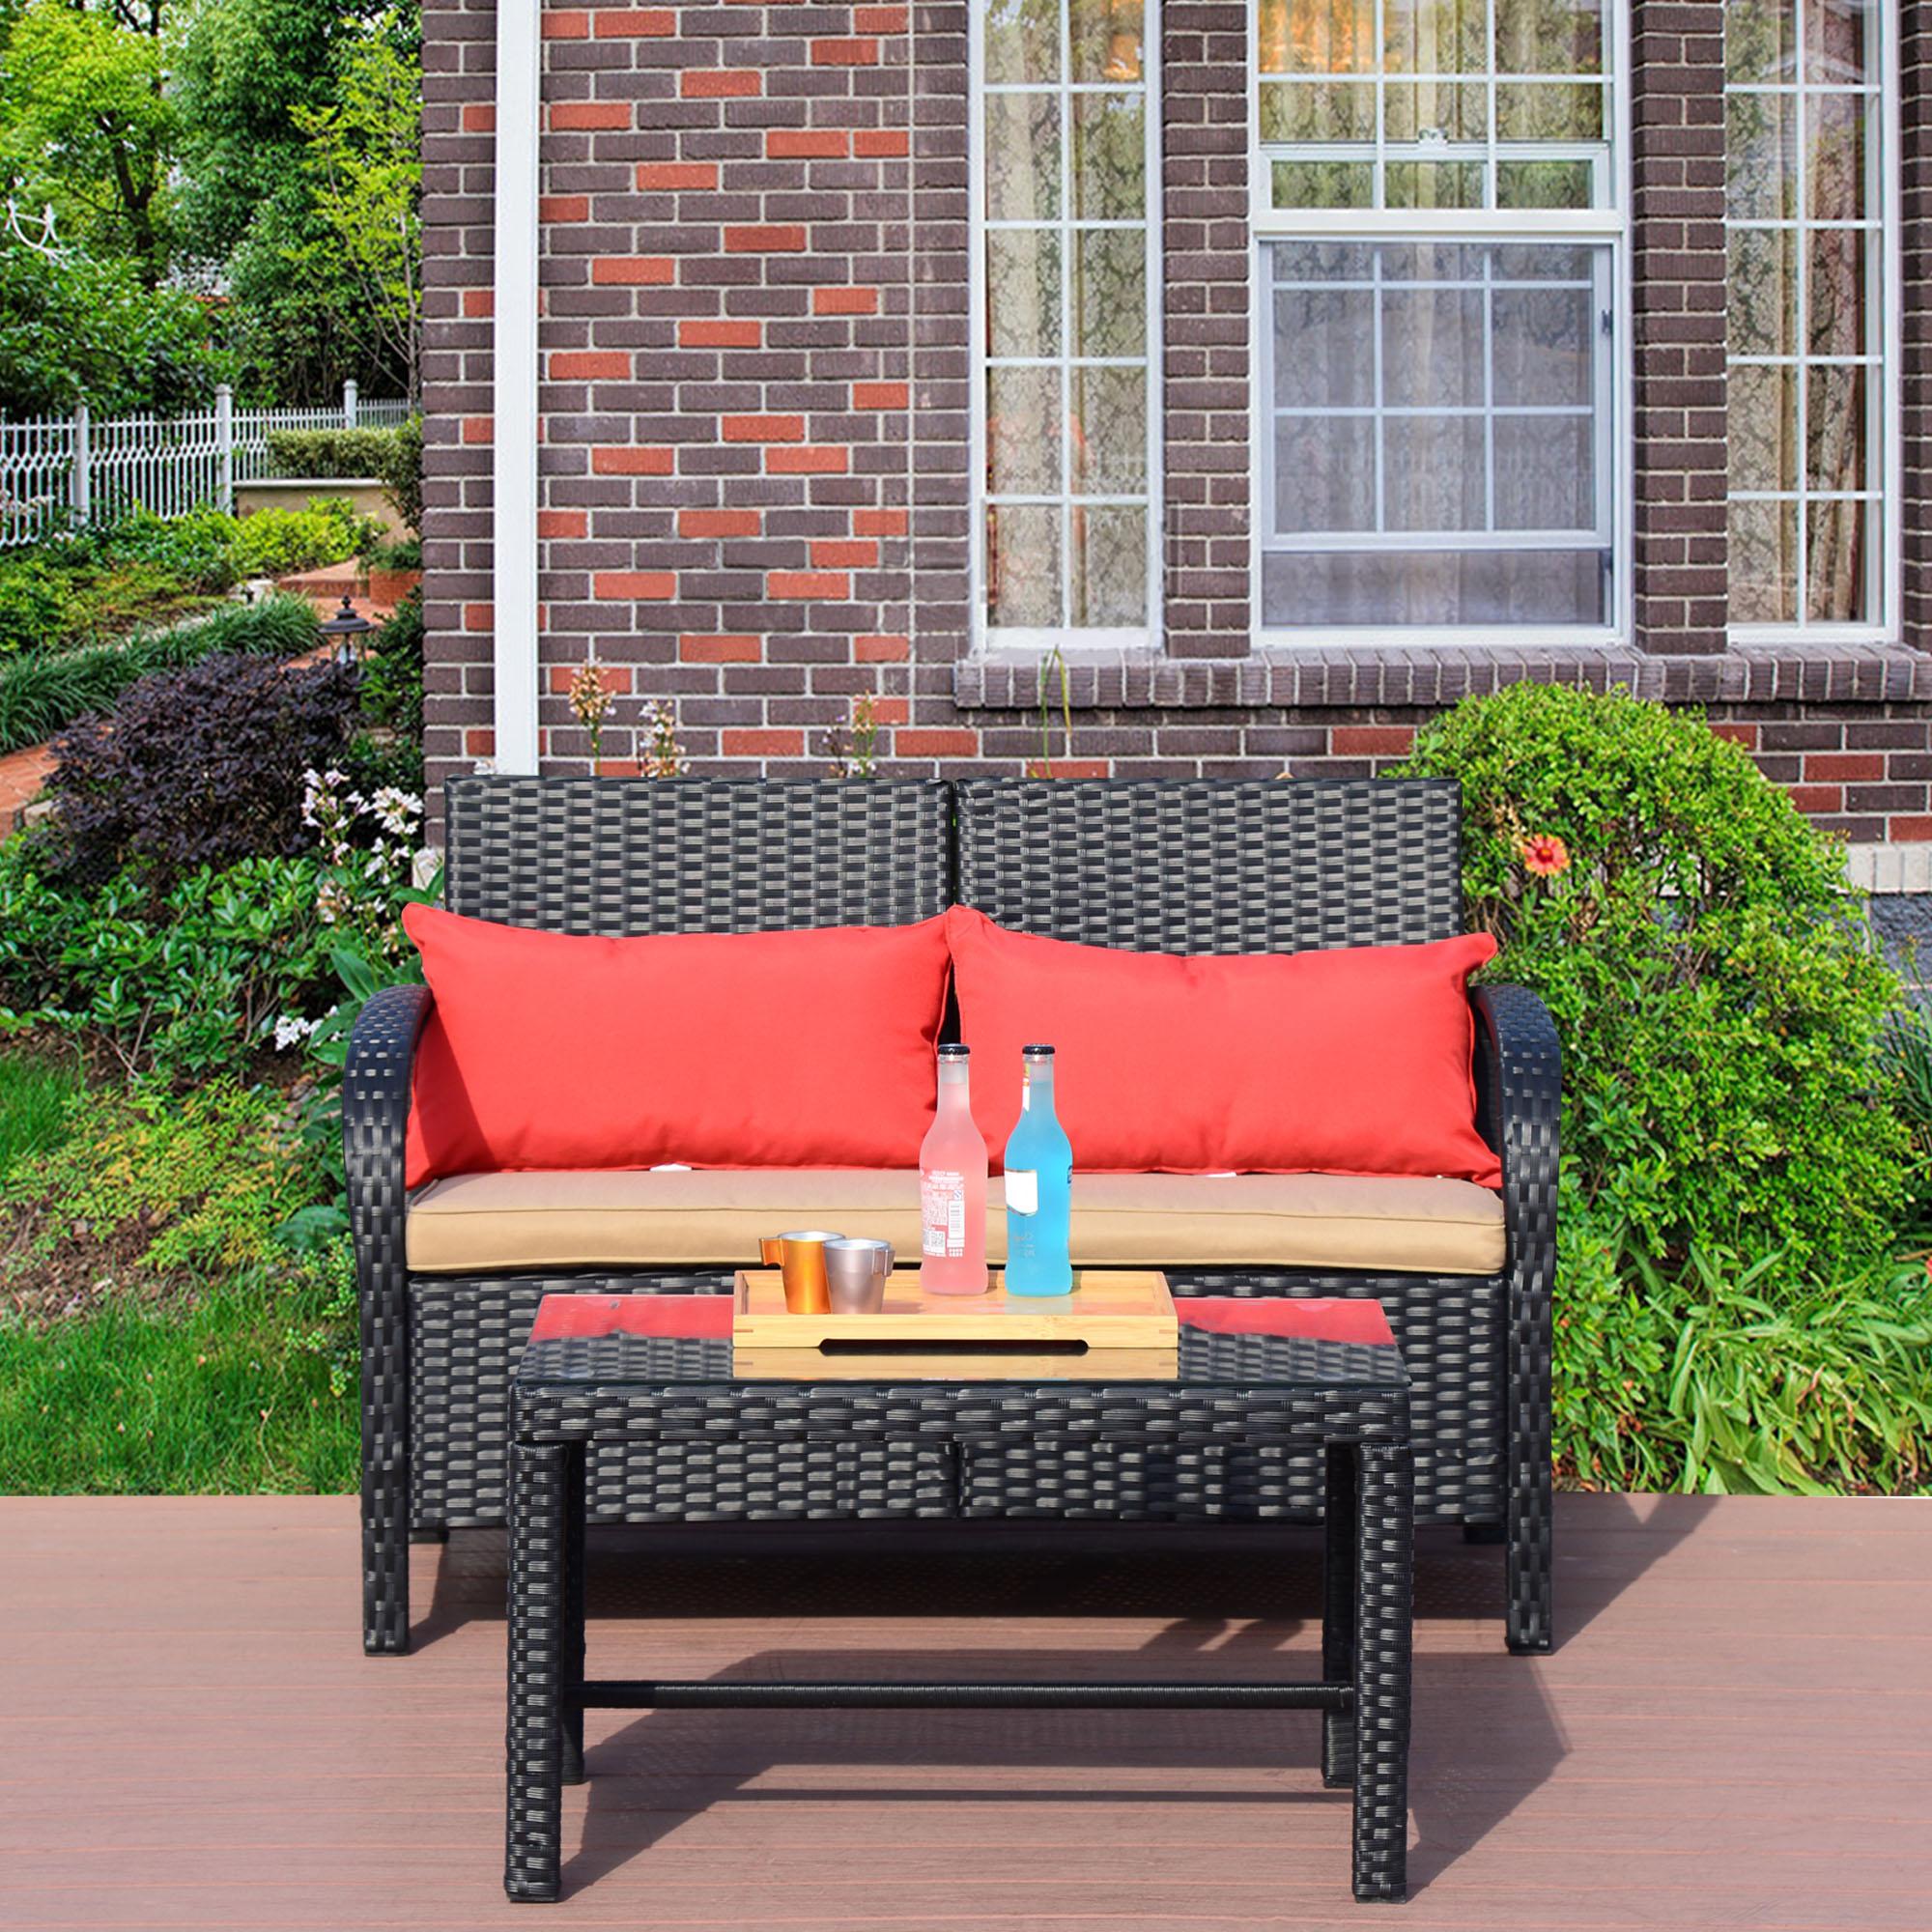 Cloud Mountain 2 PC Rattan Loveseat Sofa Furniture Bistro Set Outdoor Wicker Patio Garden Loveseat Glass Top Table